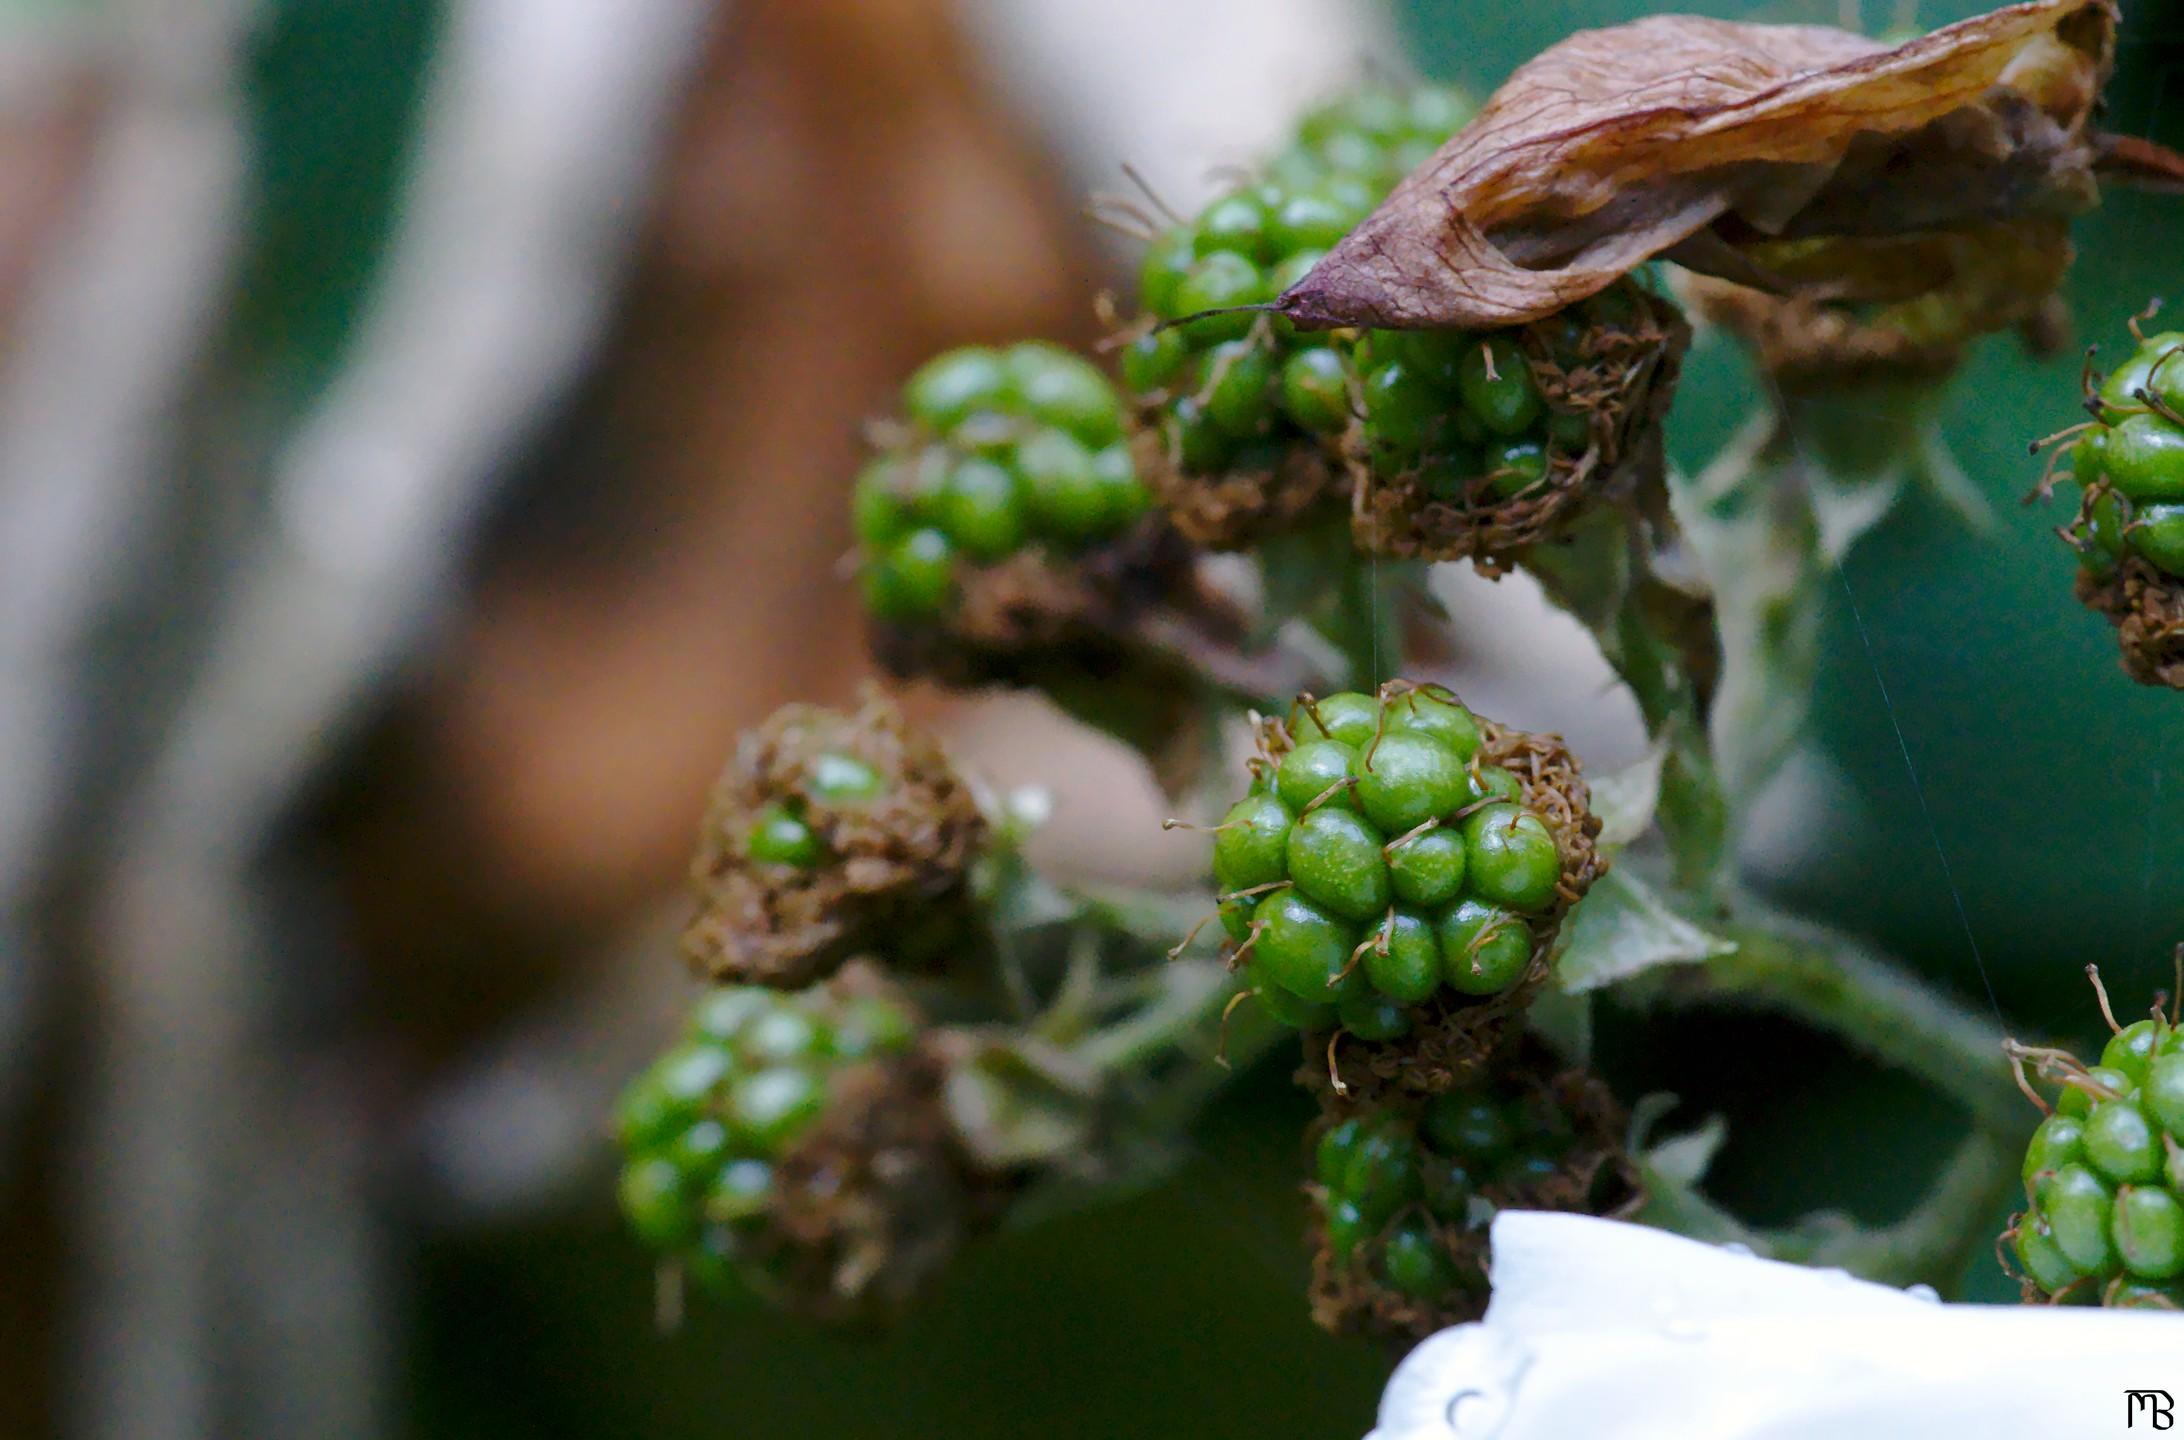 Green berries near leaves